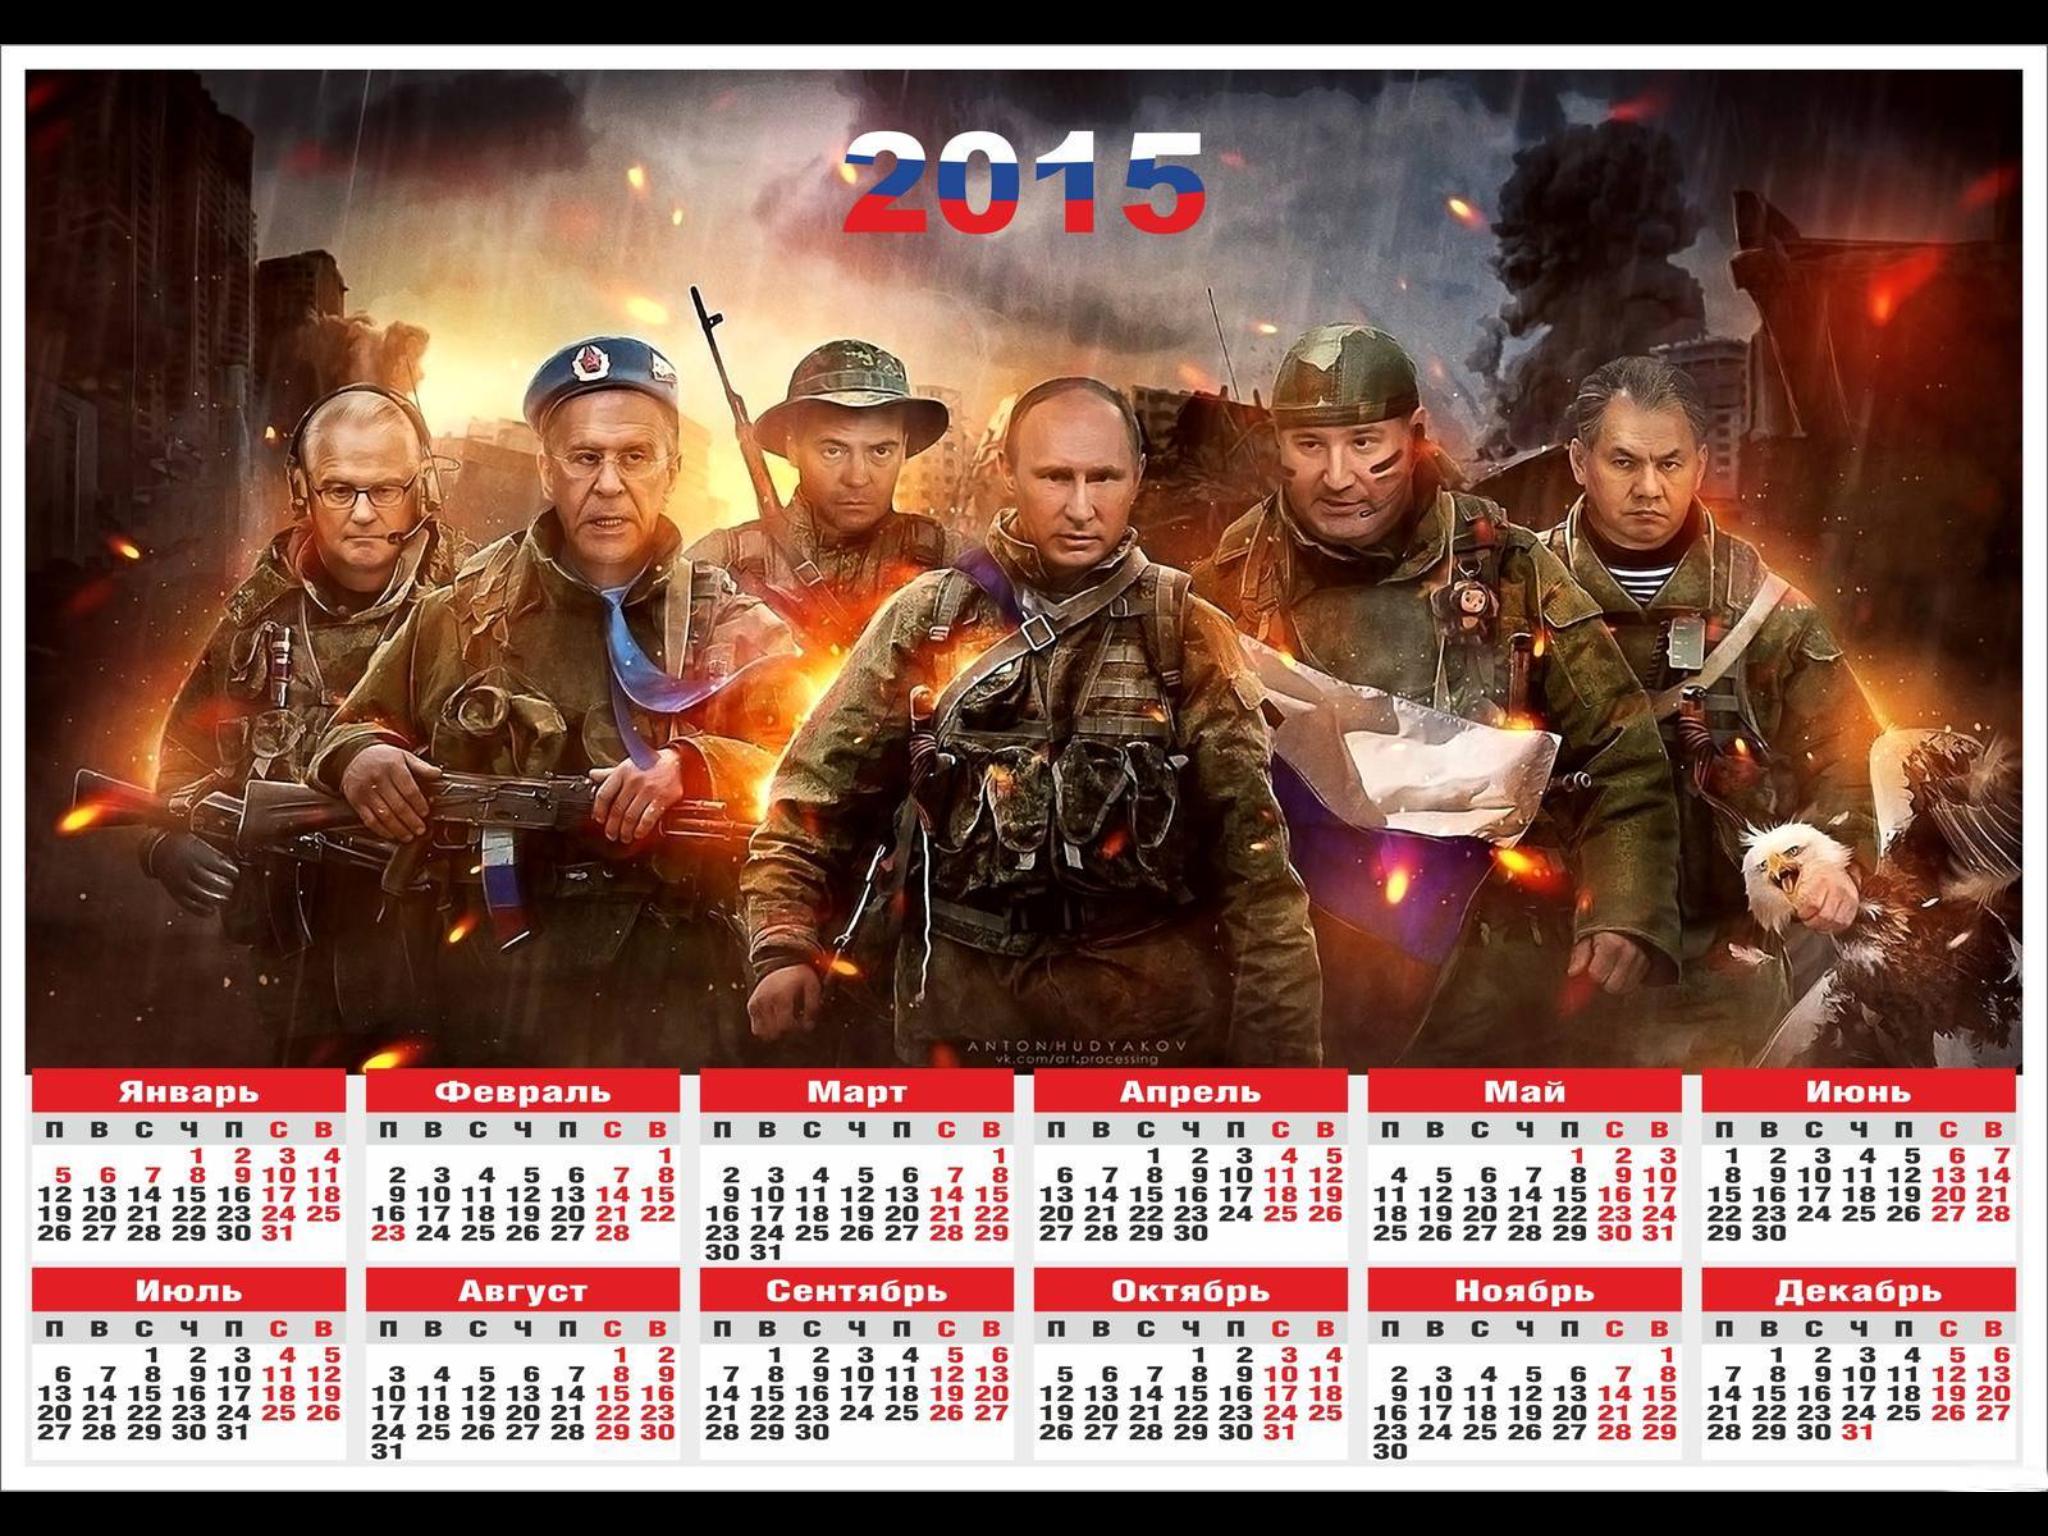 Спецназ Путина 2015